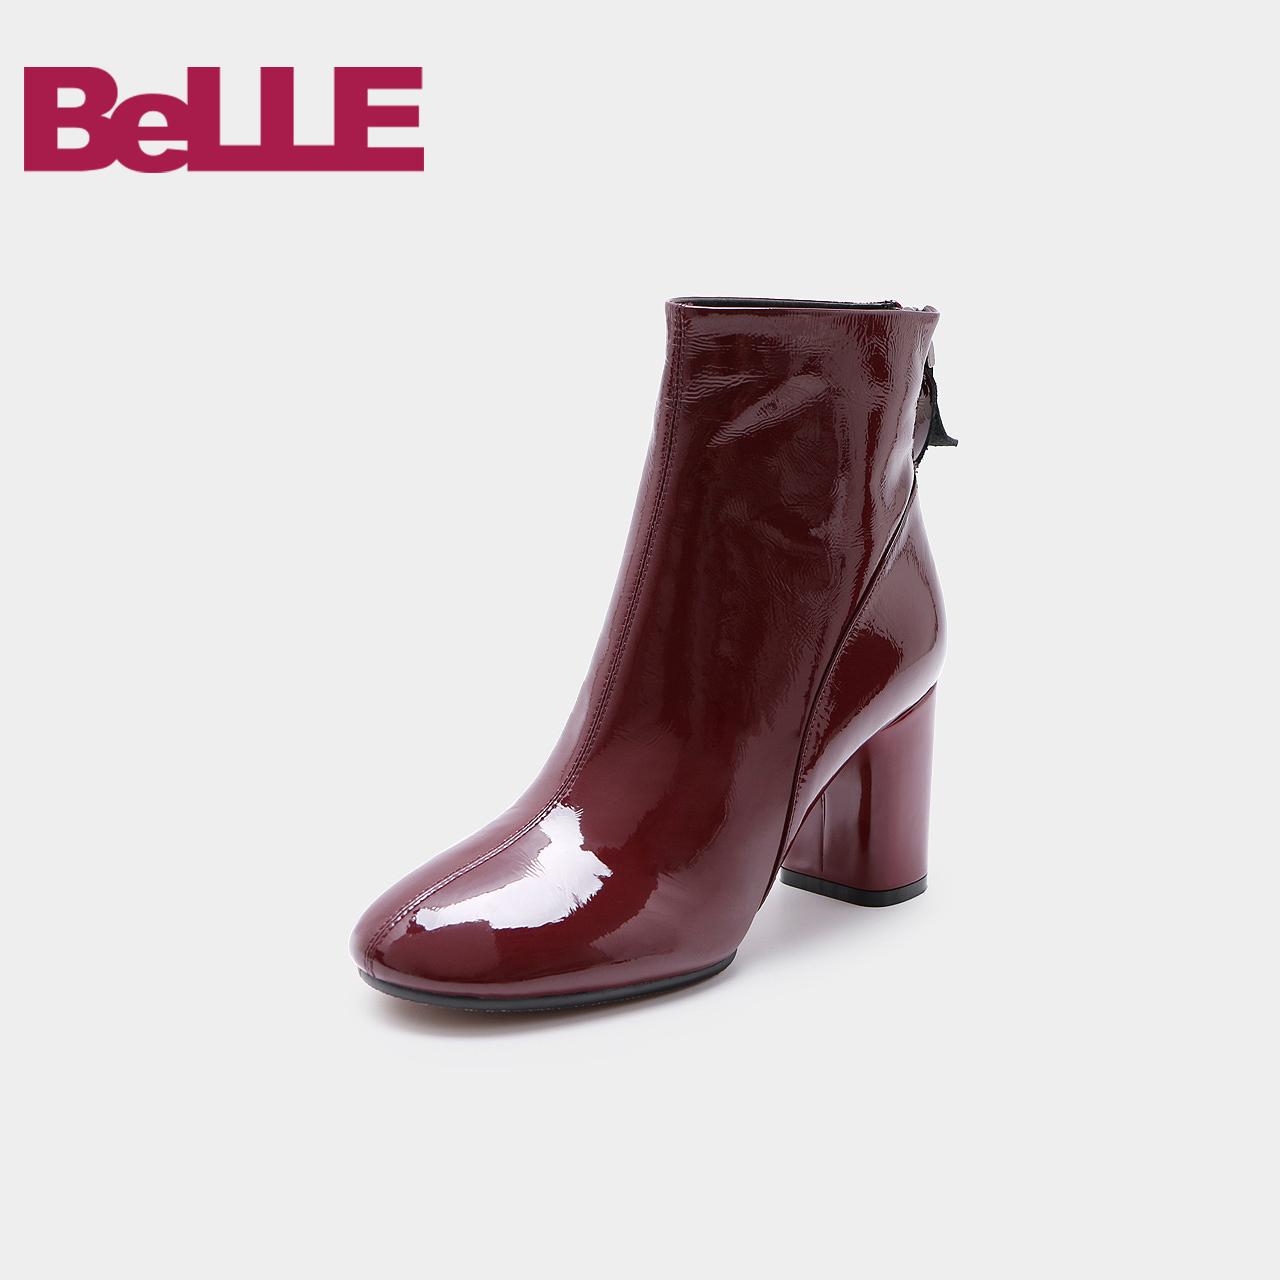 Belle-百丽2018冬季专柜新款漆牛皮革粗跟女皮靴20183DD8